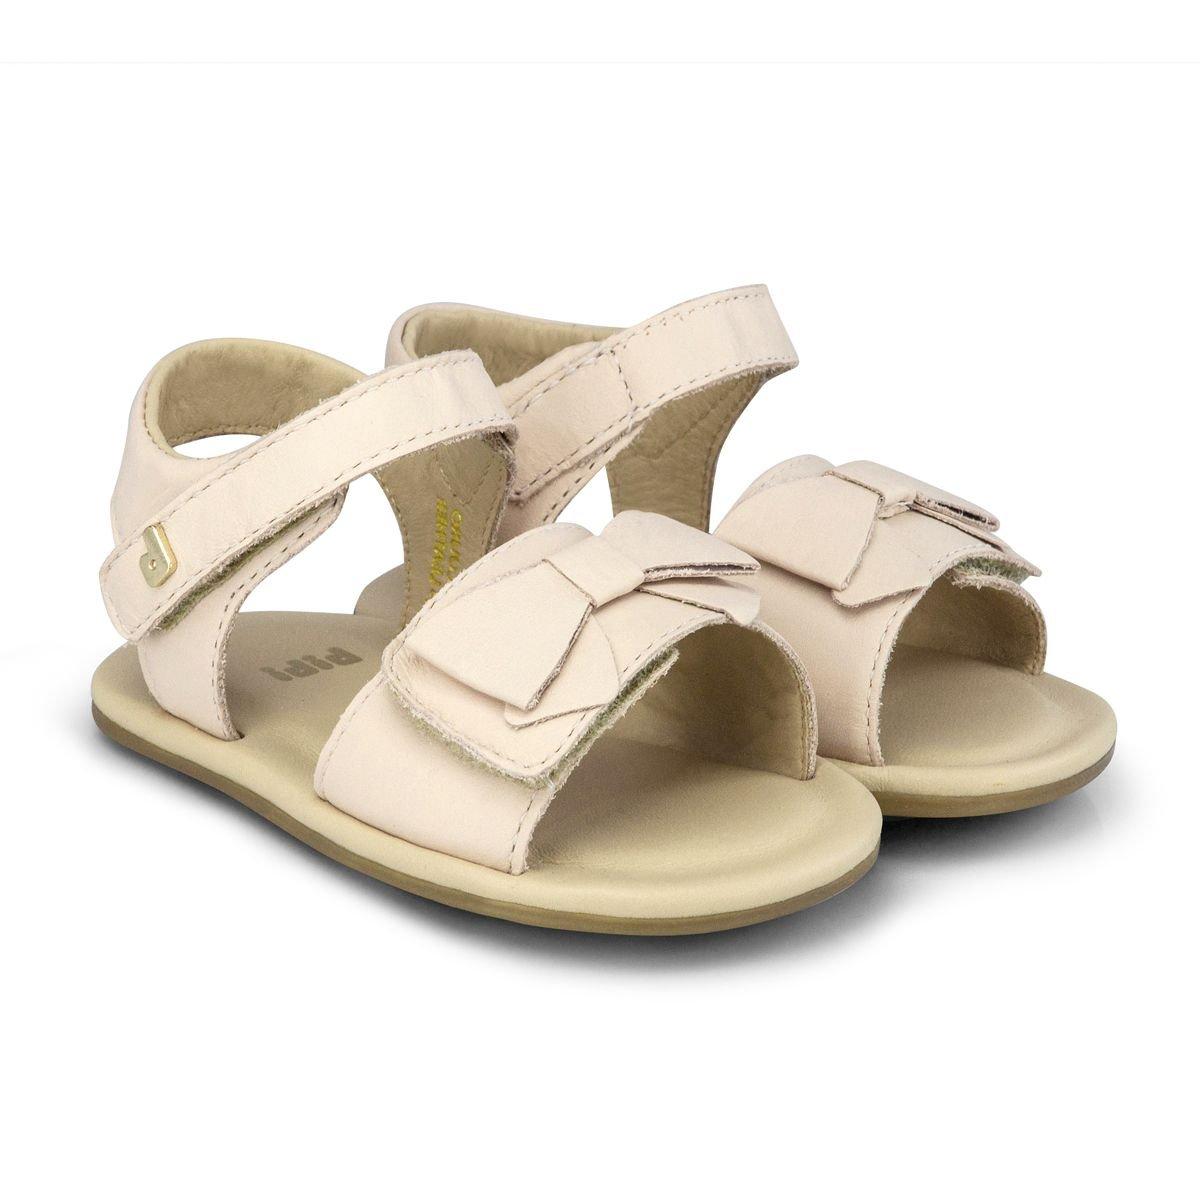 Sandale din piele Bibi Shoes Afeto, Bej